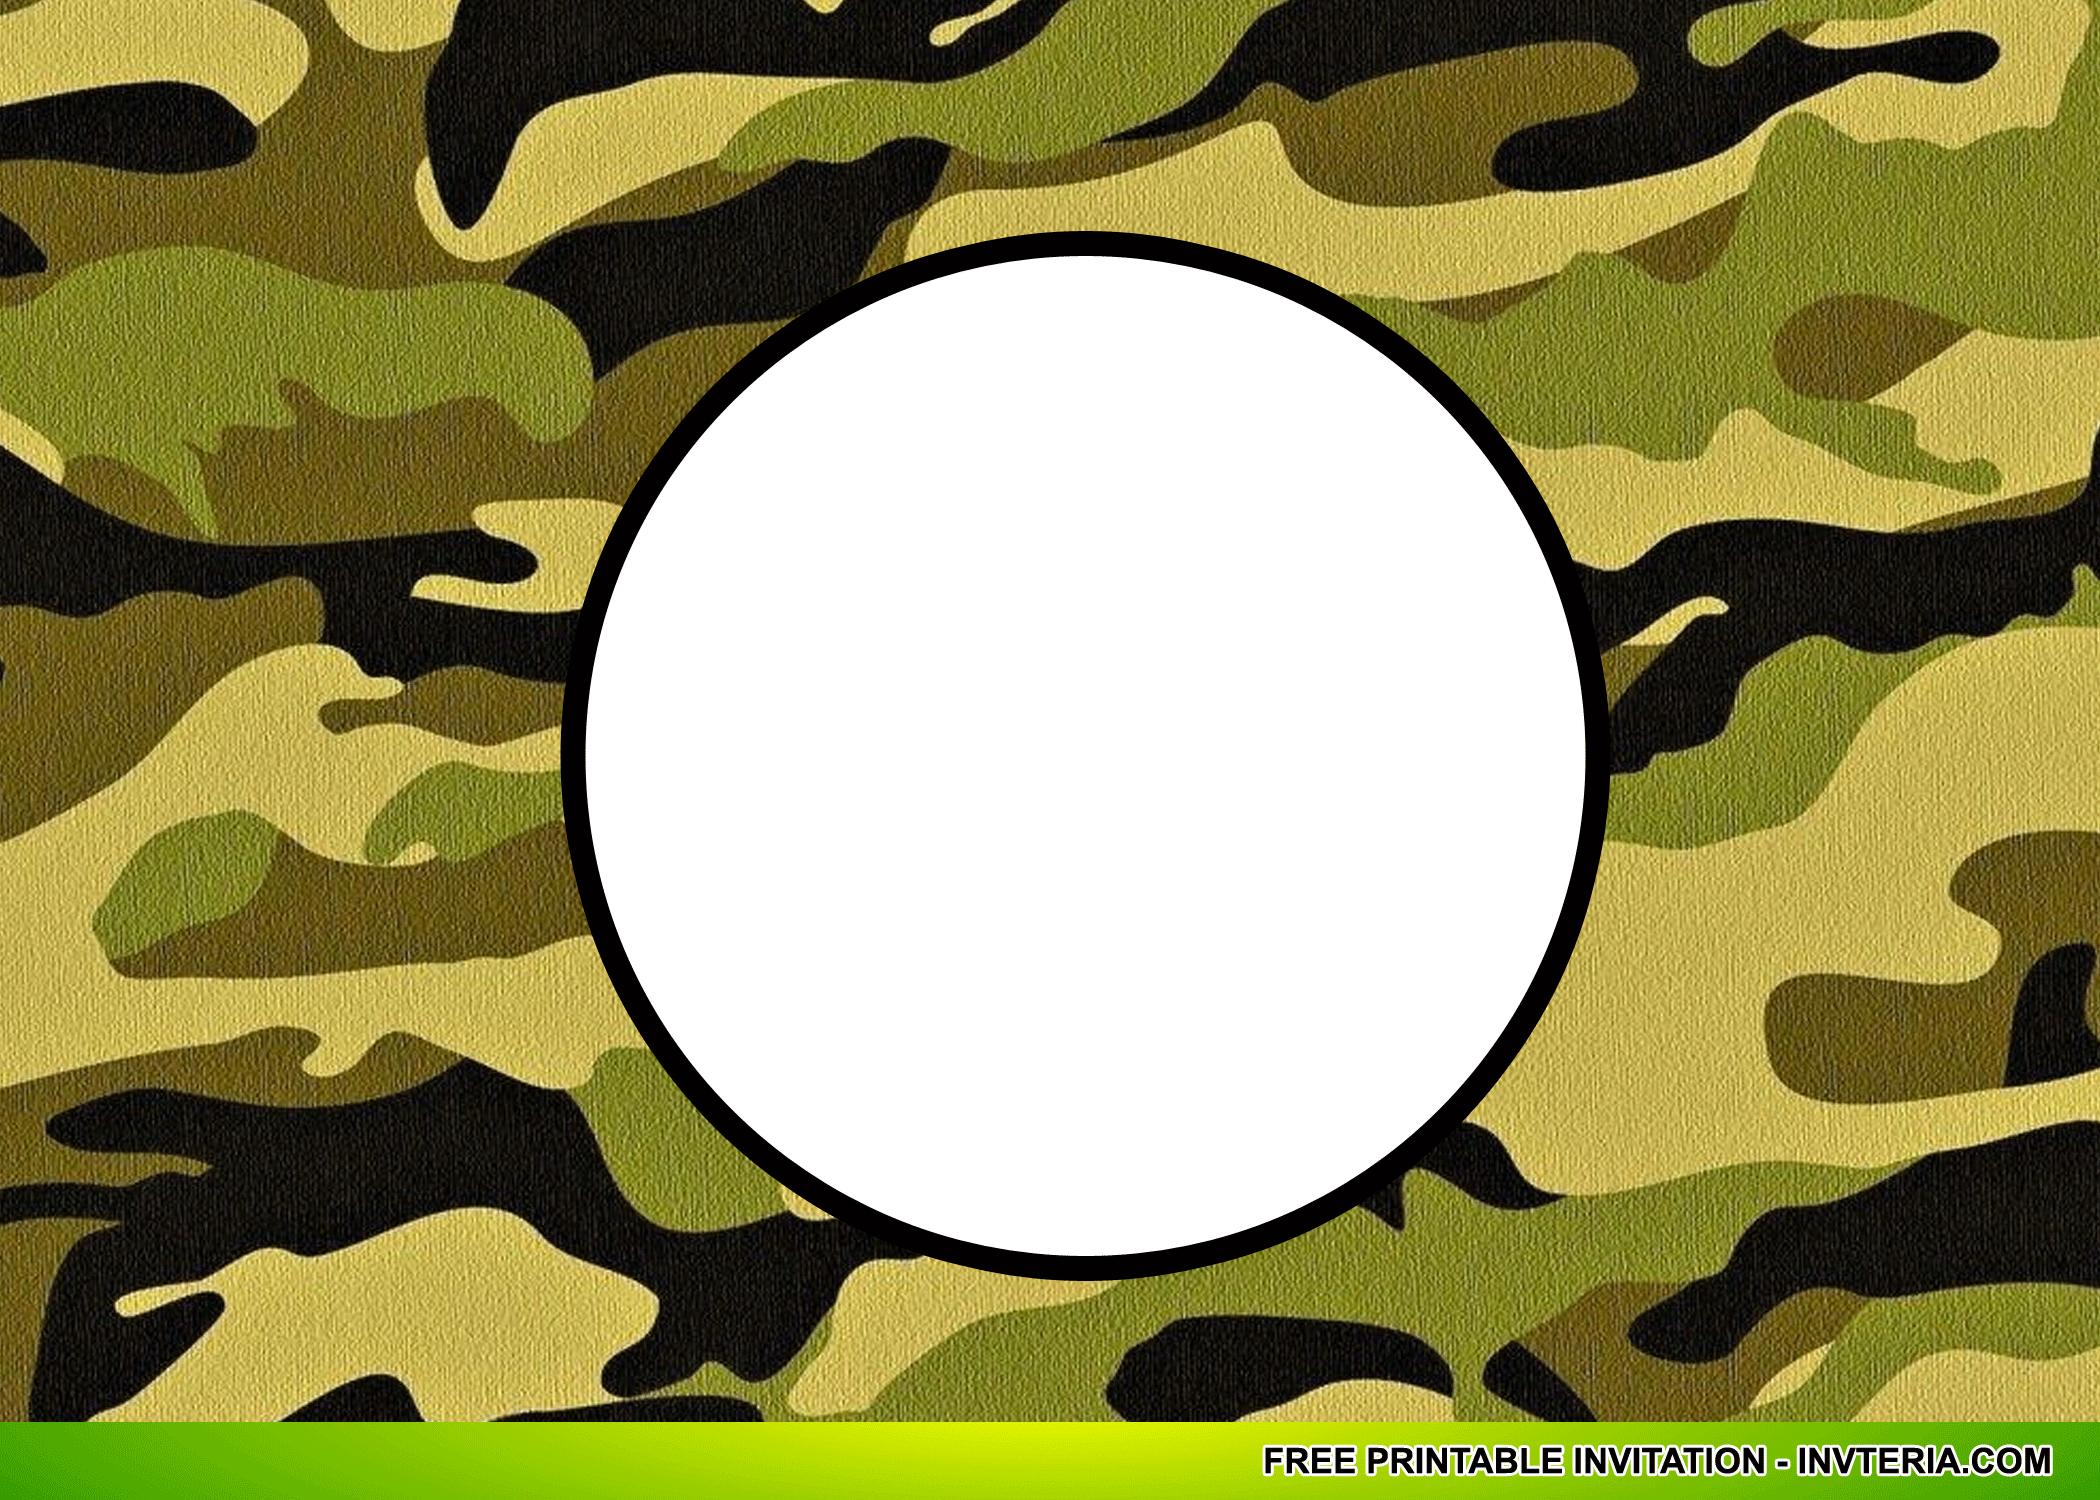 Cool Best Free Printable Camo Birthday Invitations Idea   Invitation - Free Printable Camouflage Invitations